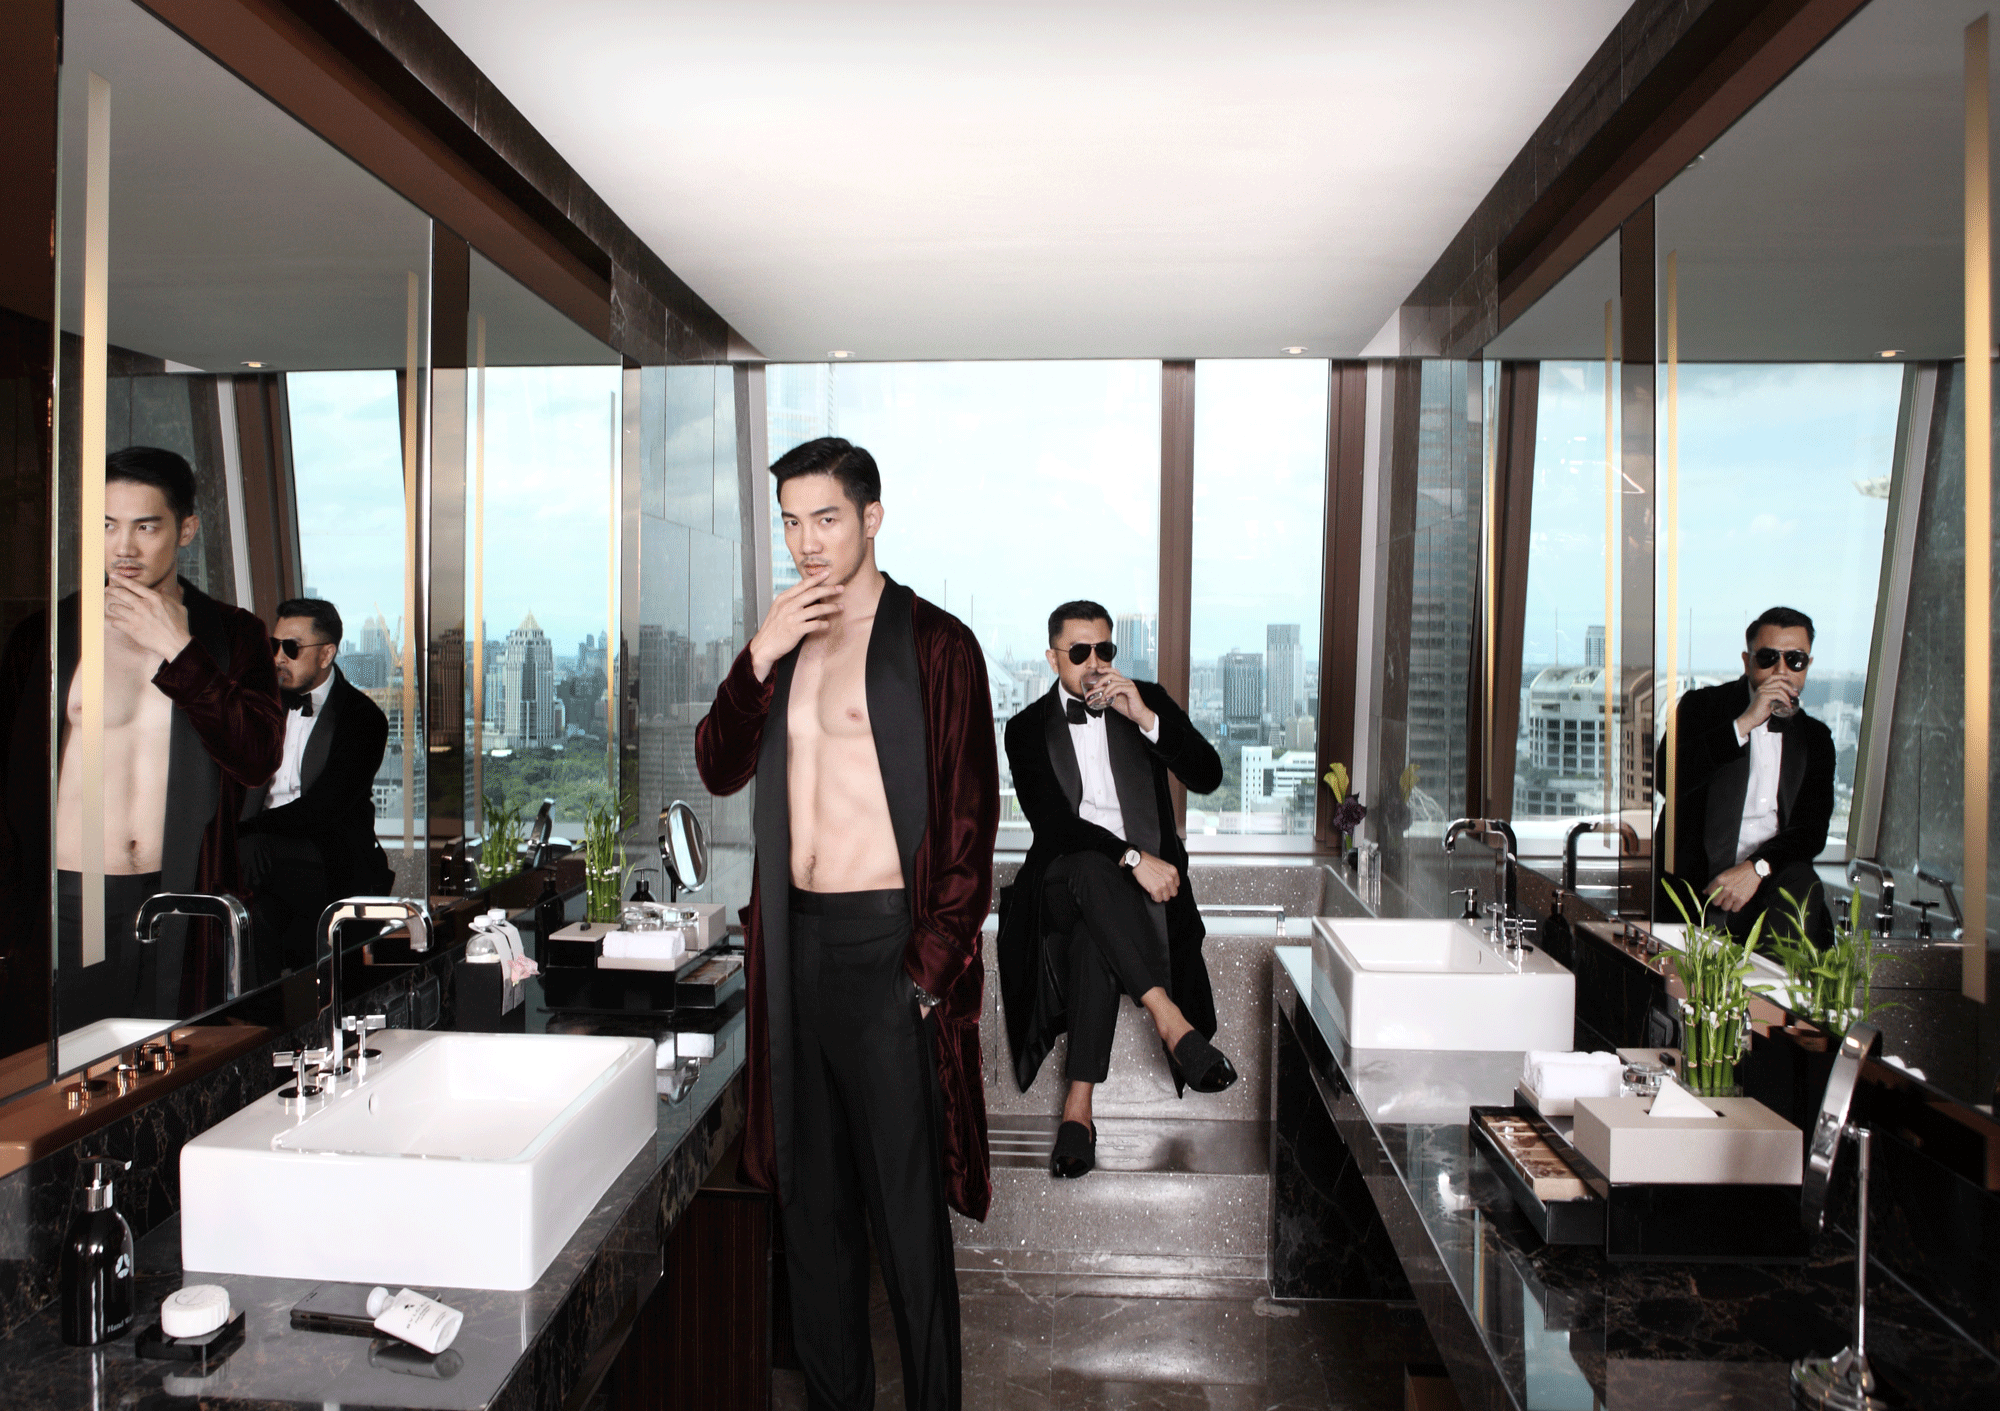 Rangsit ; robe : ASAVA / pants :VVON SUGUNNASIL  Polpat :sunglasses : Alexander McQueen